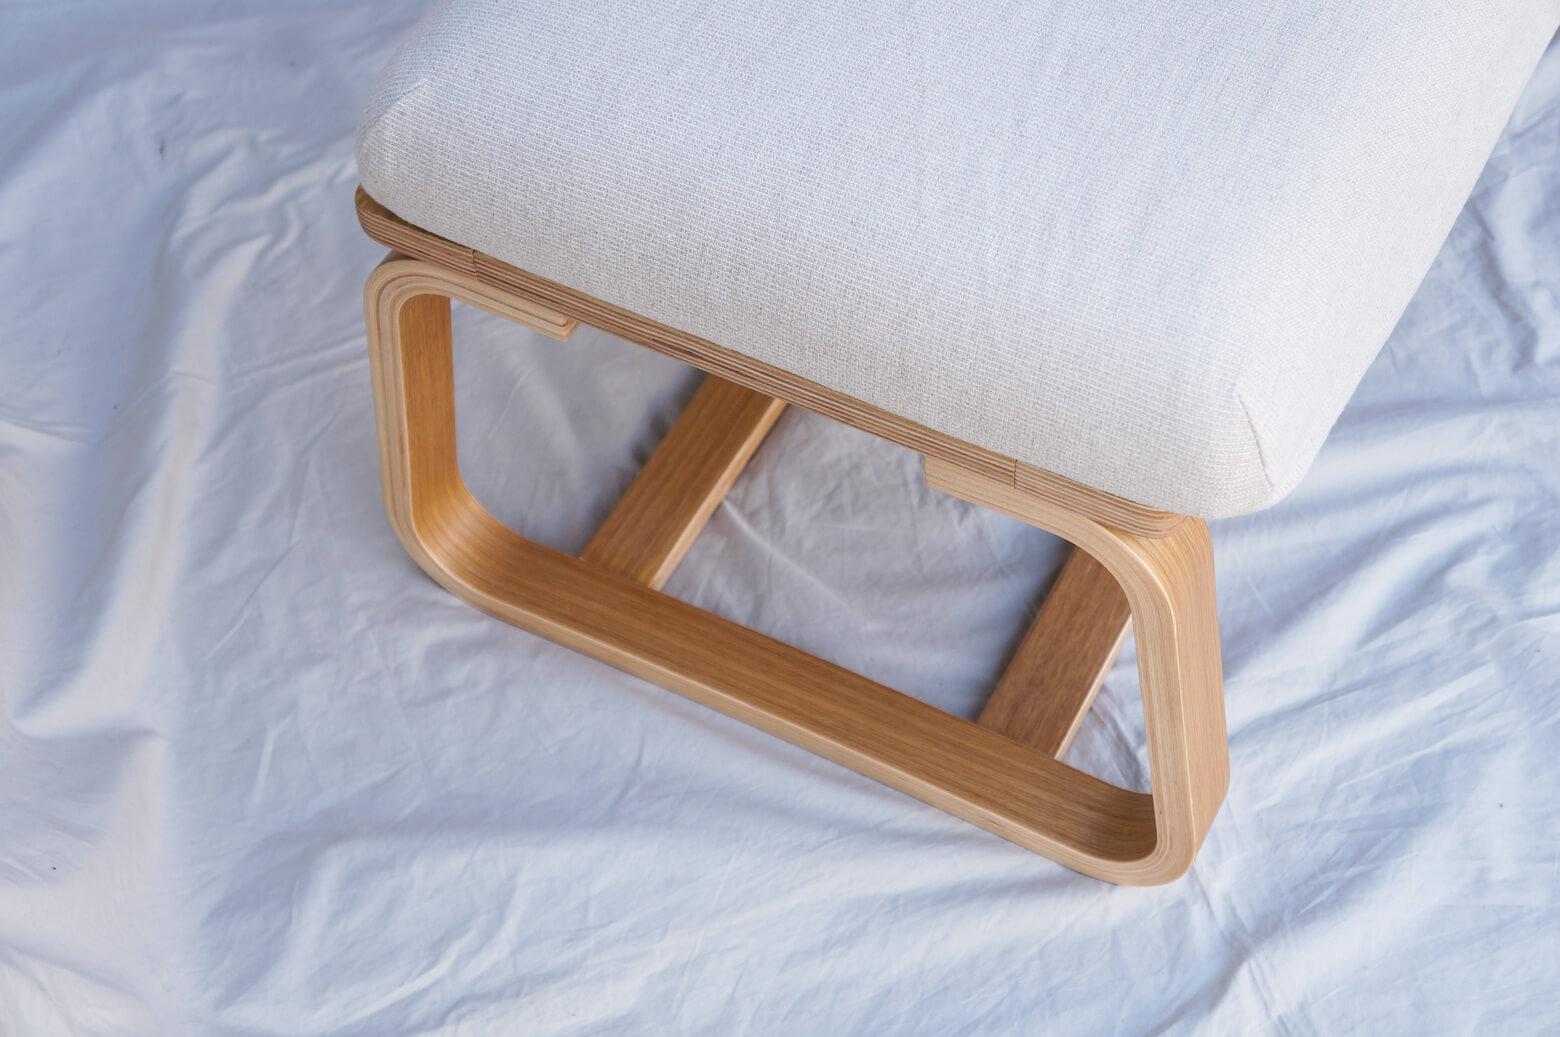 MUJI Oakwood Bench/無印良品 リビングでもダイニングでもつかえるベンチ オーク材 ナチュラル シンプル